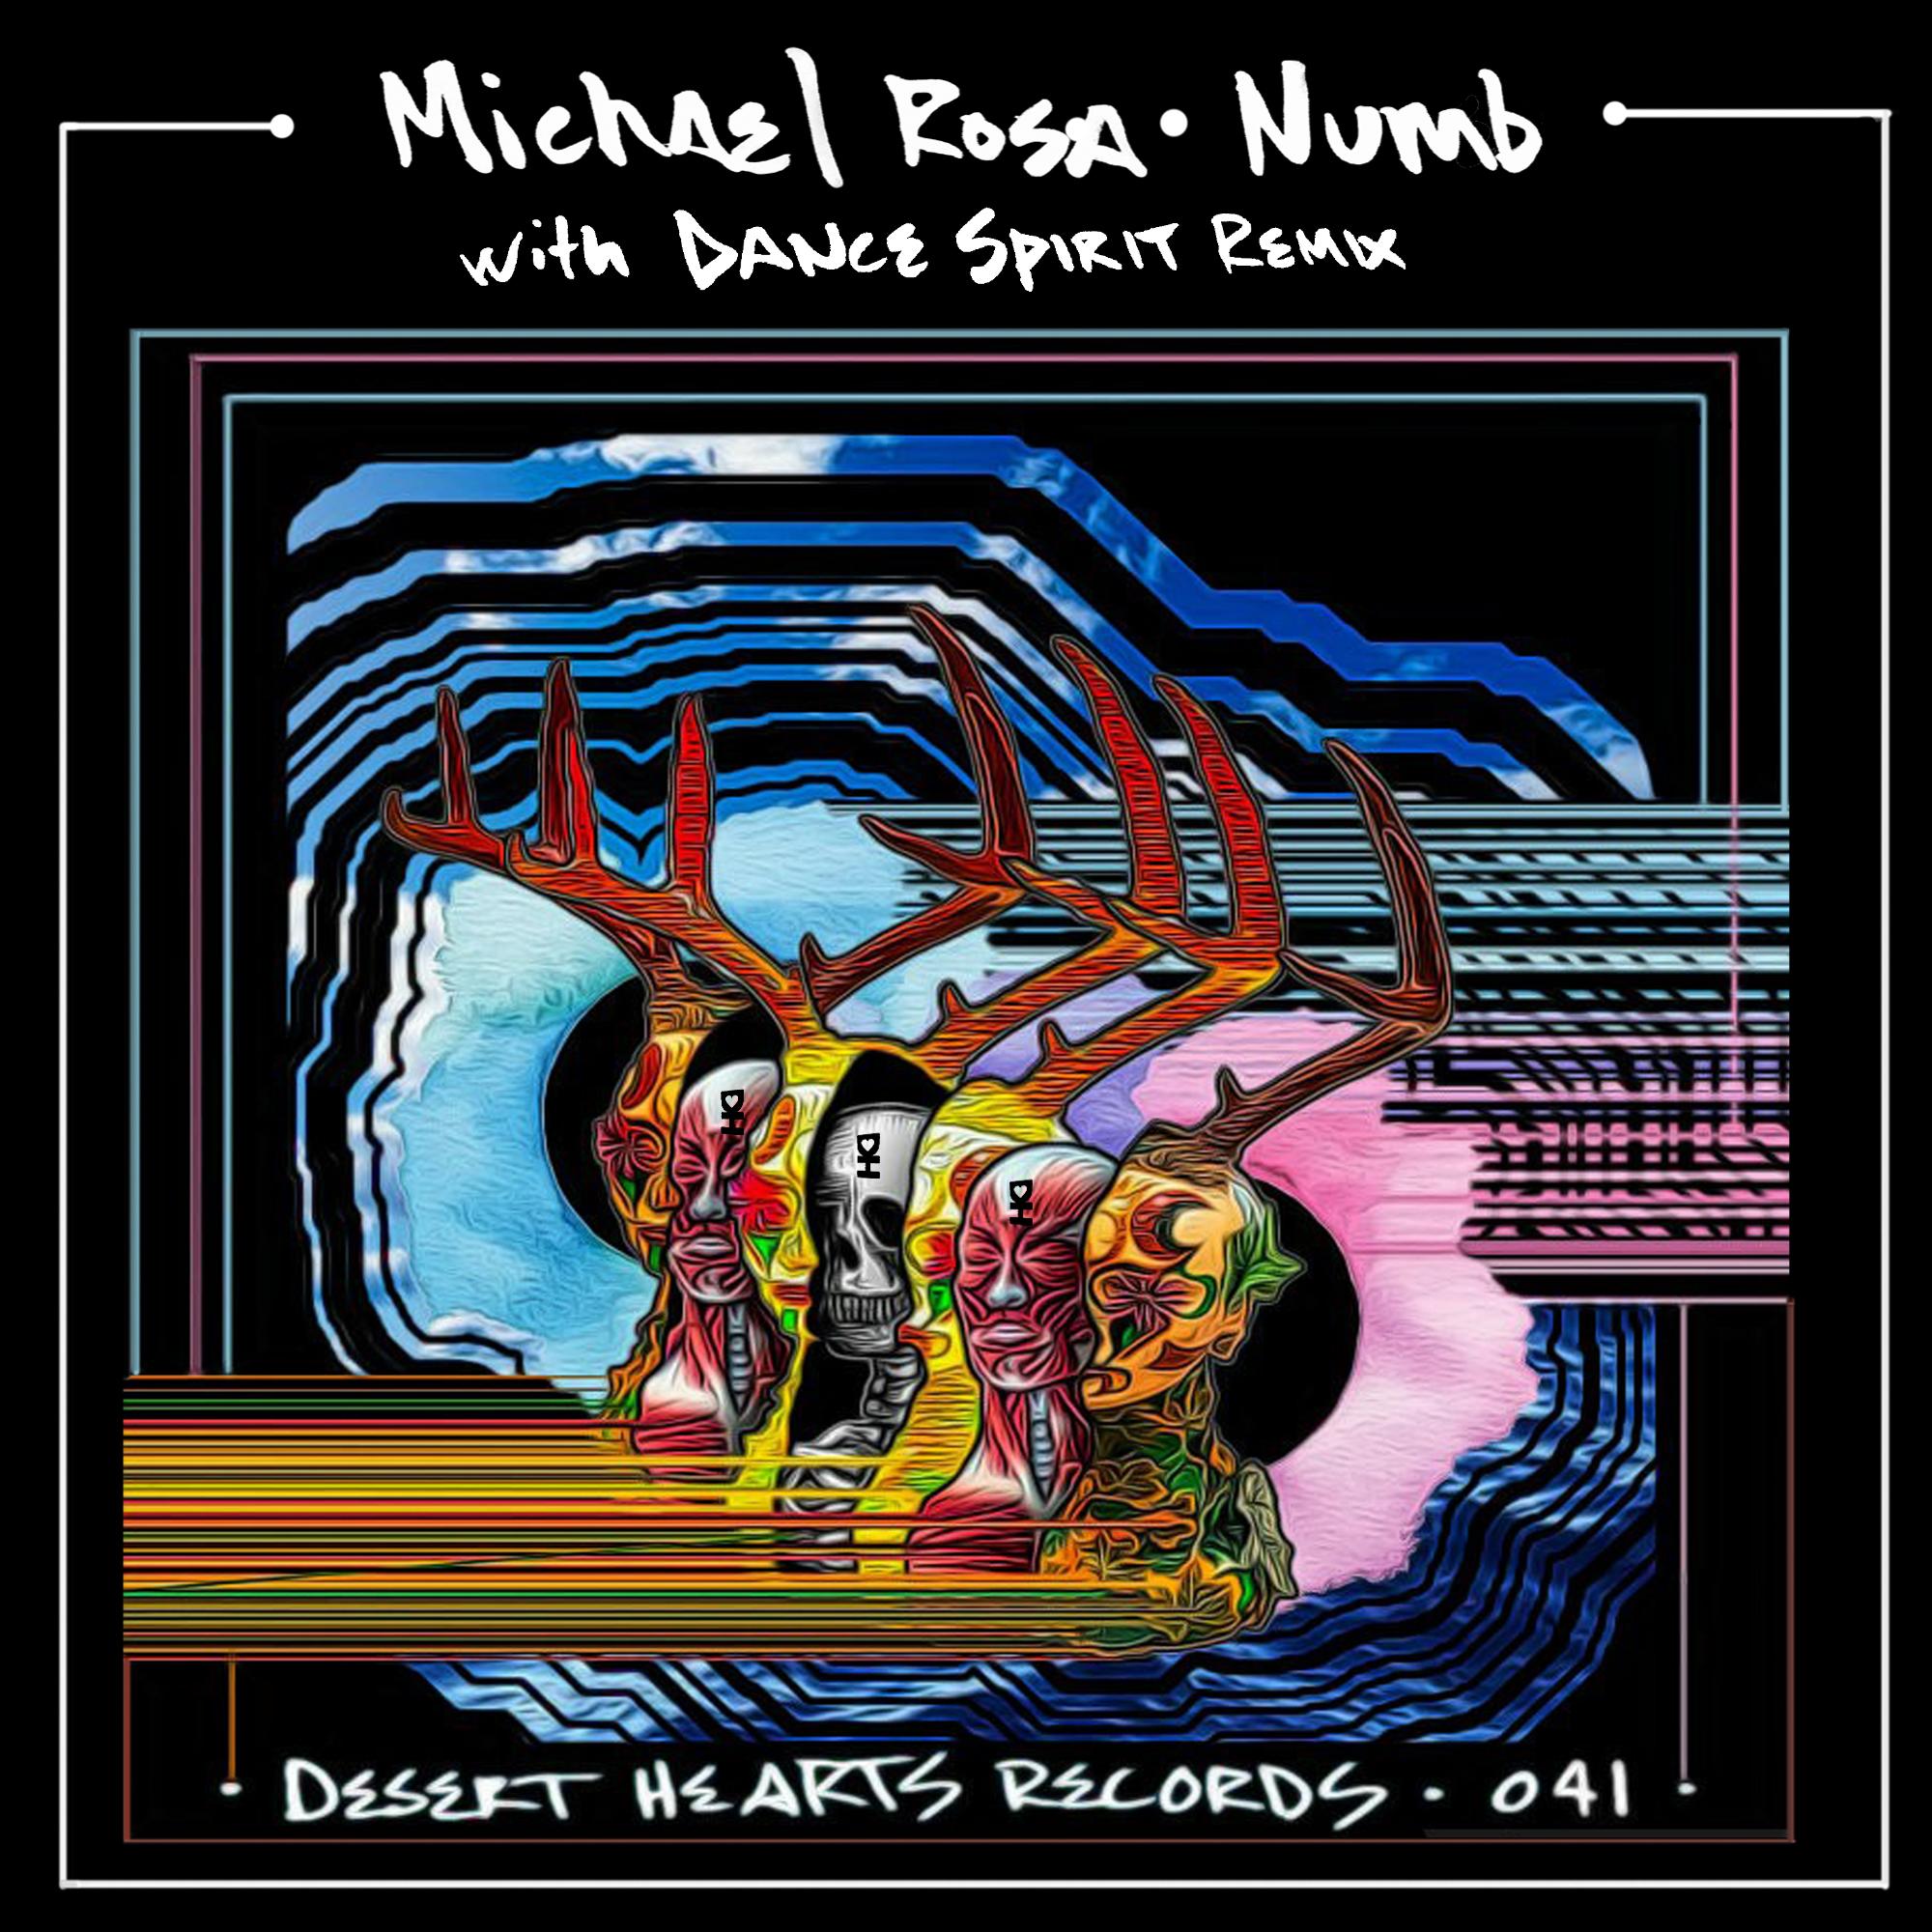 [DH041] - Michael Rosa Numb EP.jpg